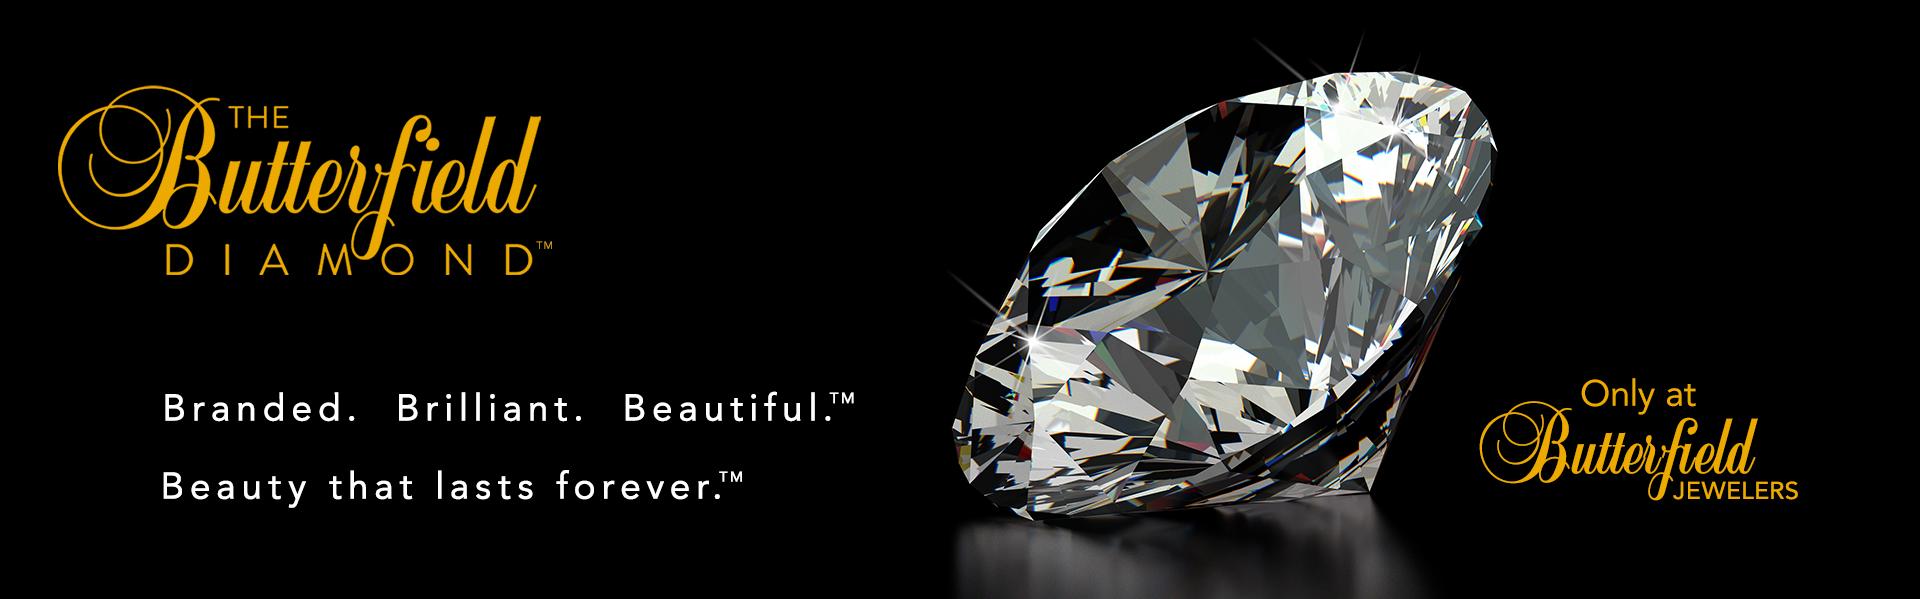 c3bea2802 Butterfield Jewelers   Albuquerque, NM